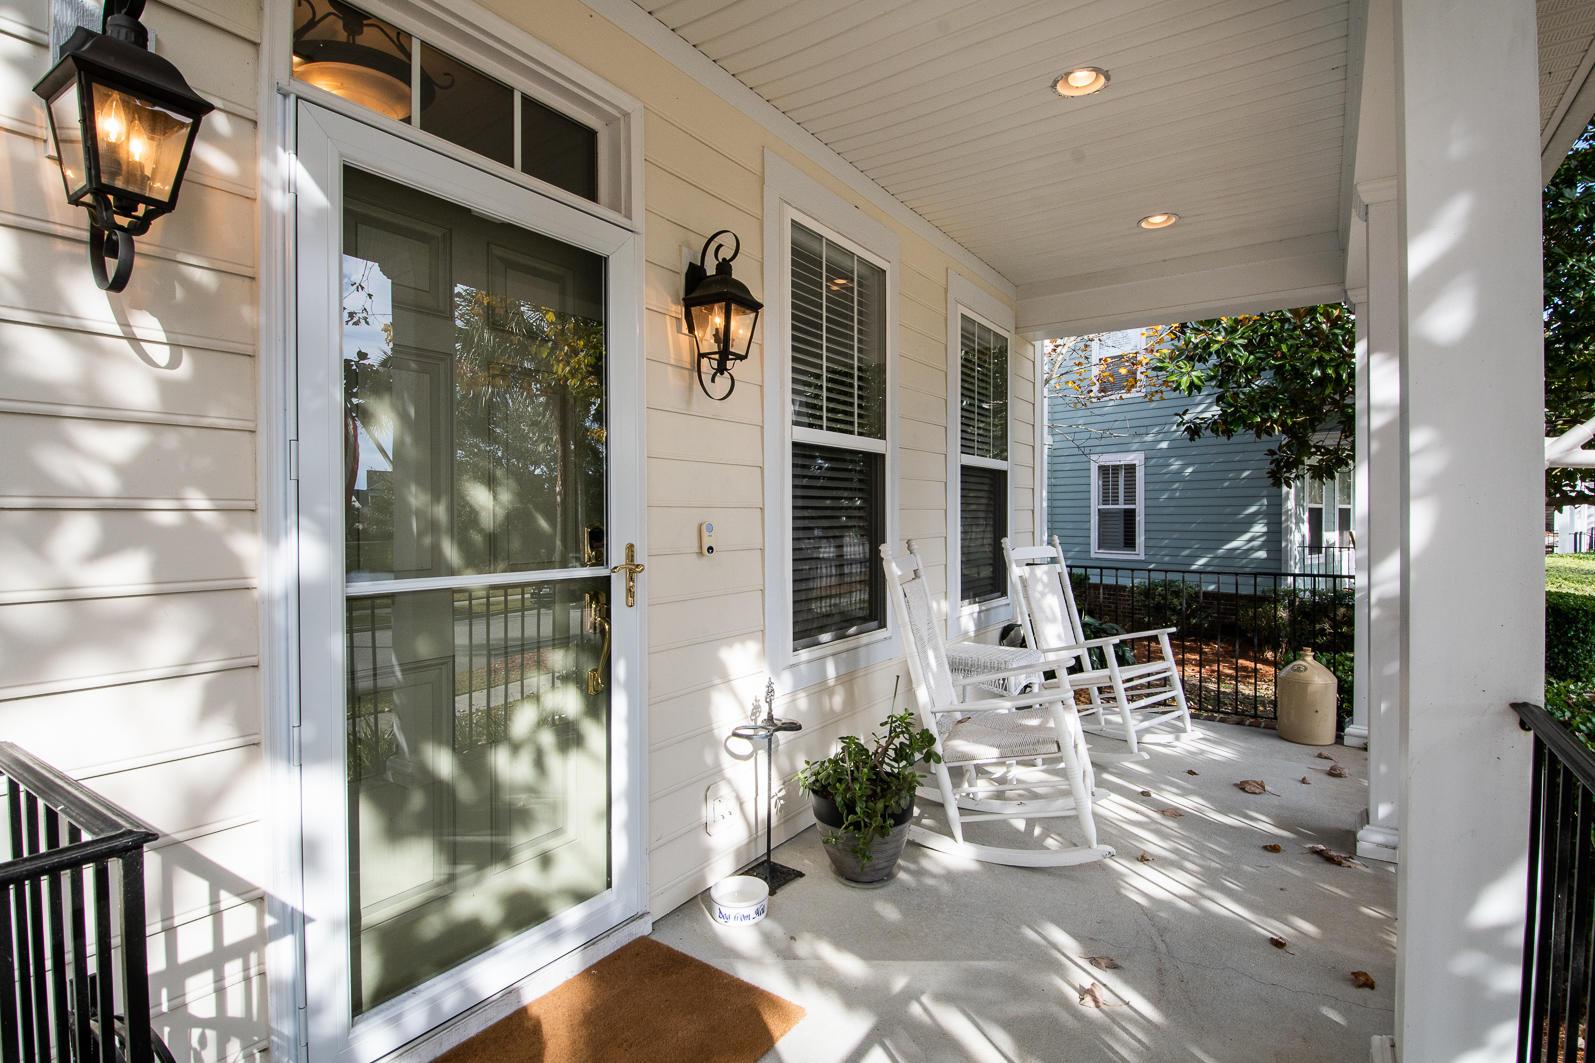 Barfield Park Homes For Sale - 1941 Pierce, Charleston, SC - 0